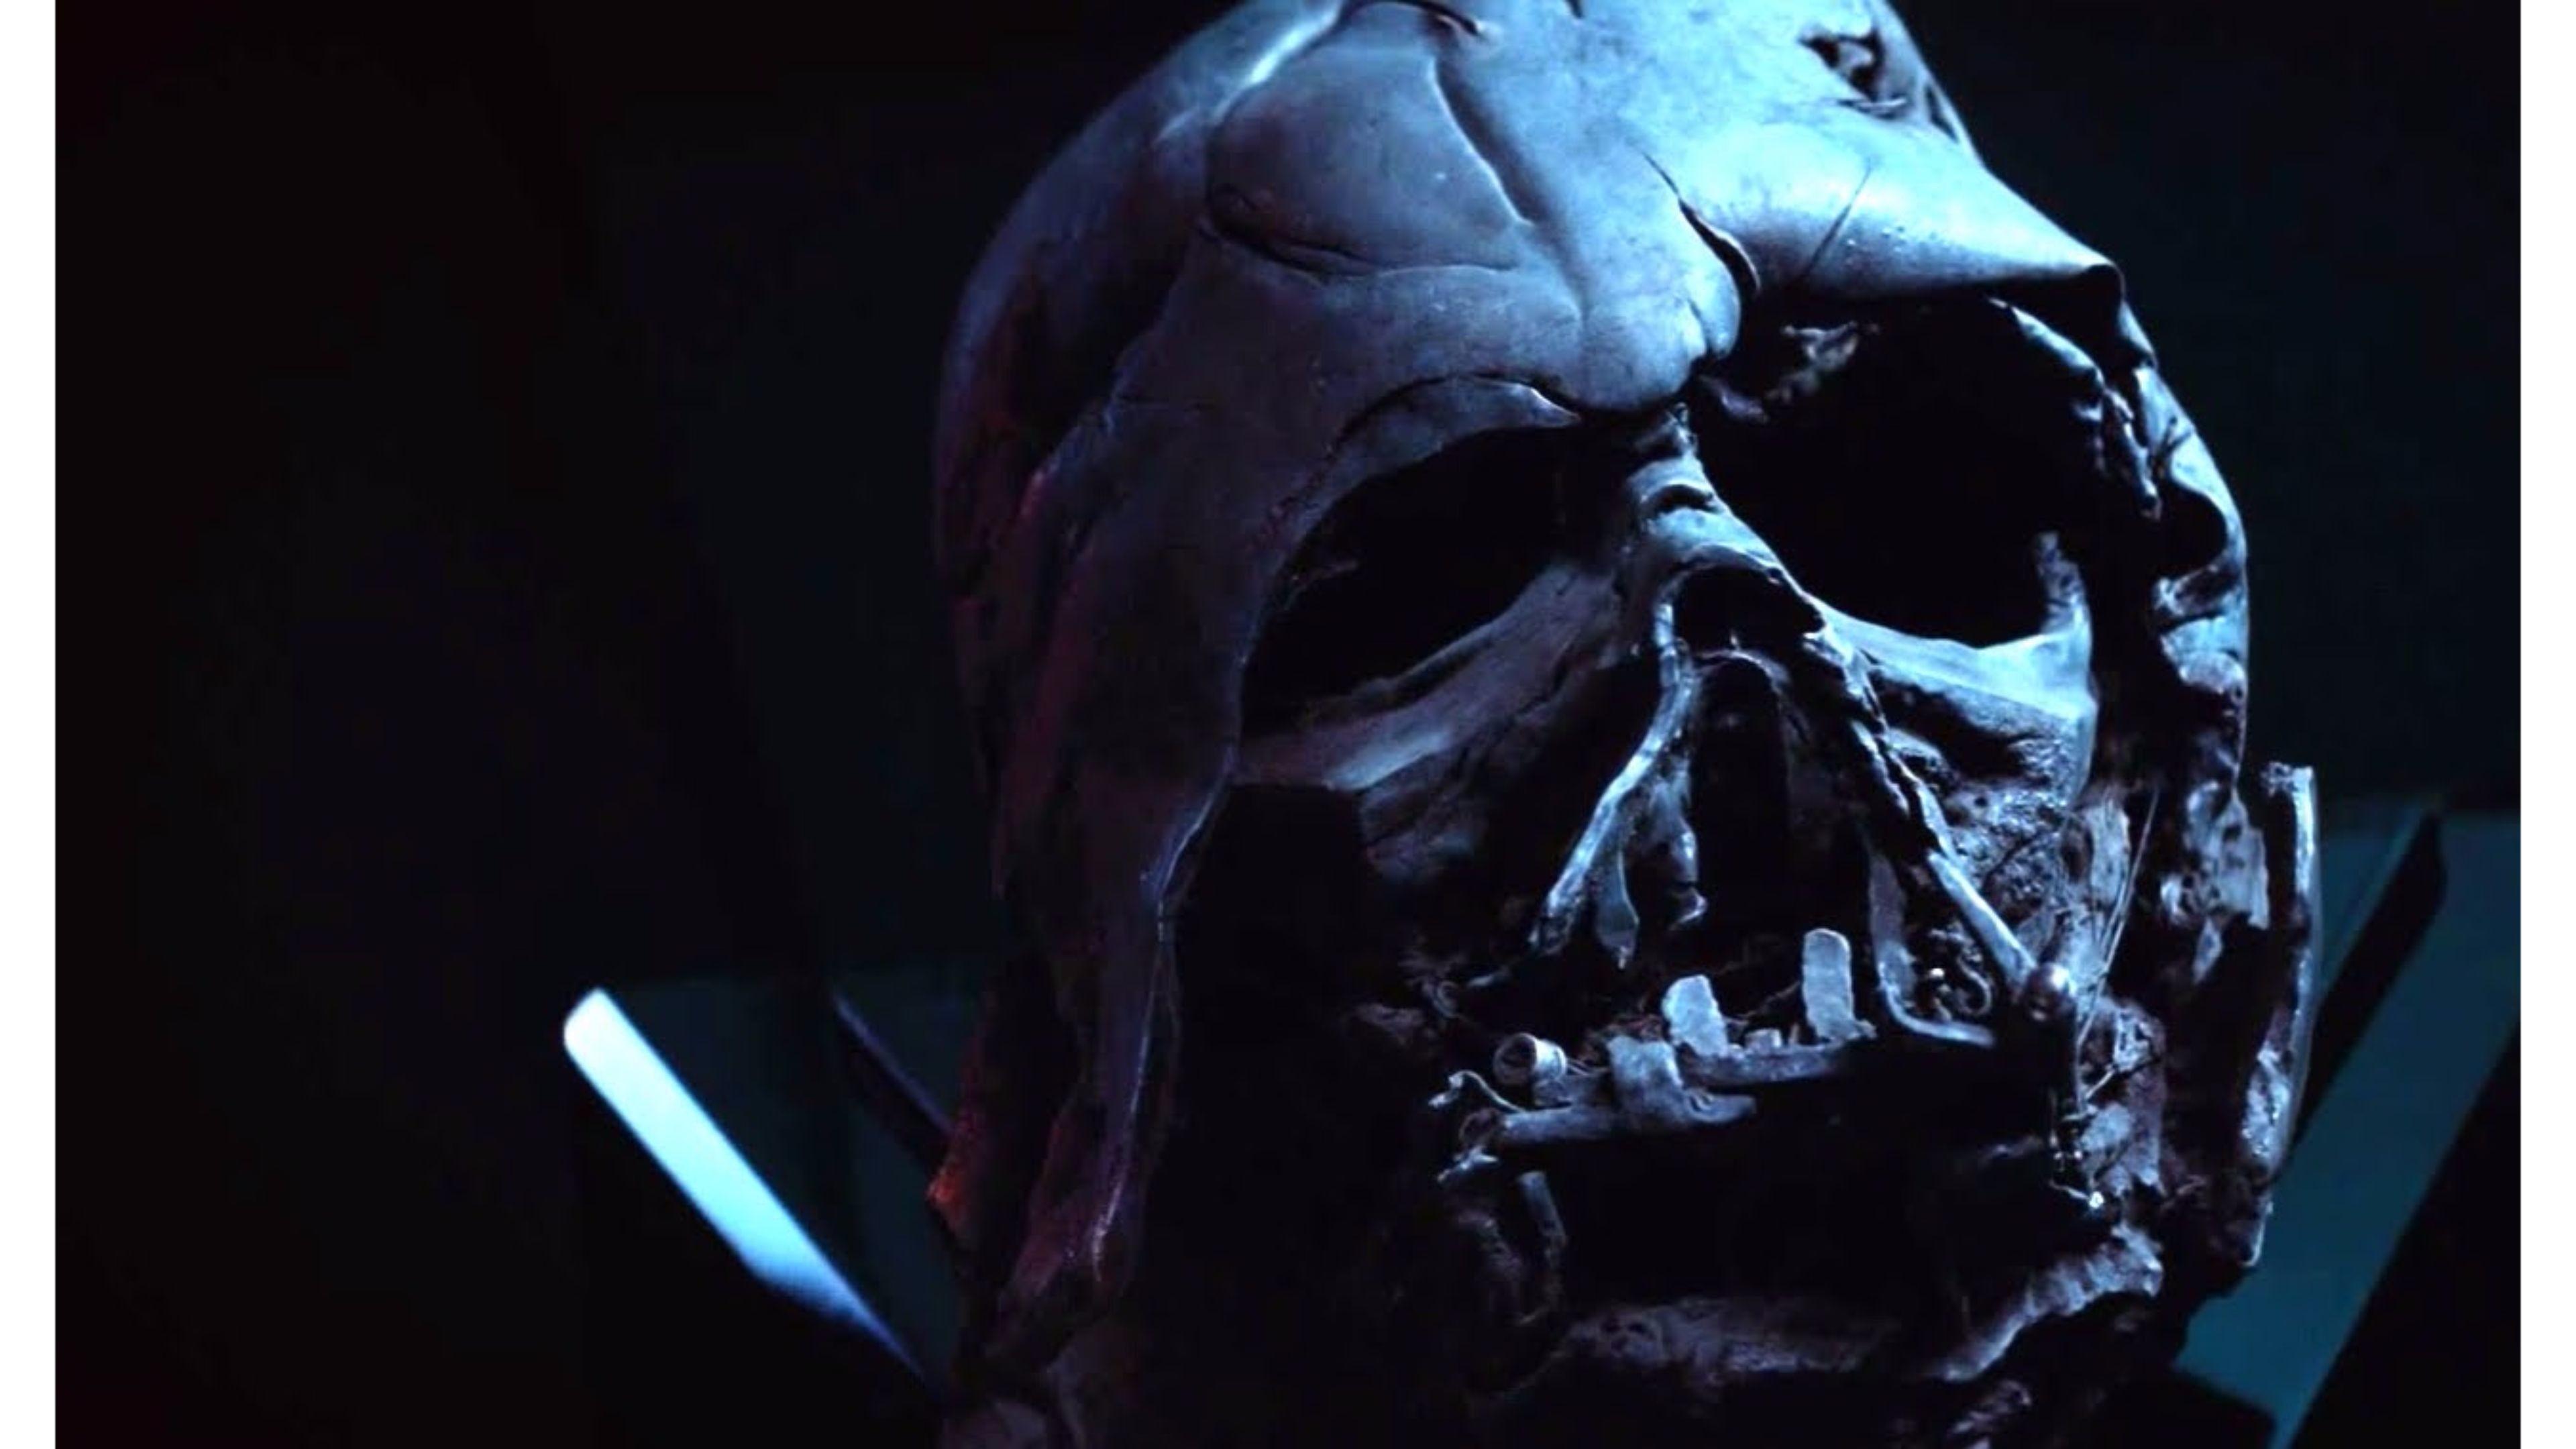 2581 Star Wars HD Wallpapers | Backgrounds – <b>Wallpaper</b>